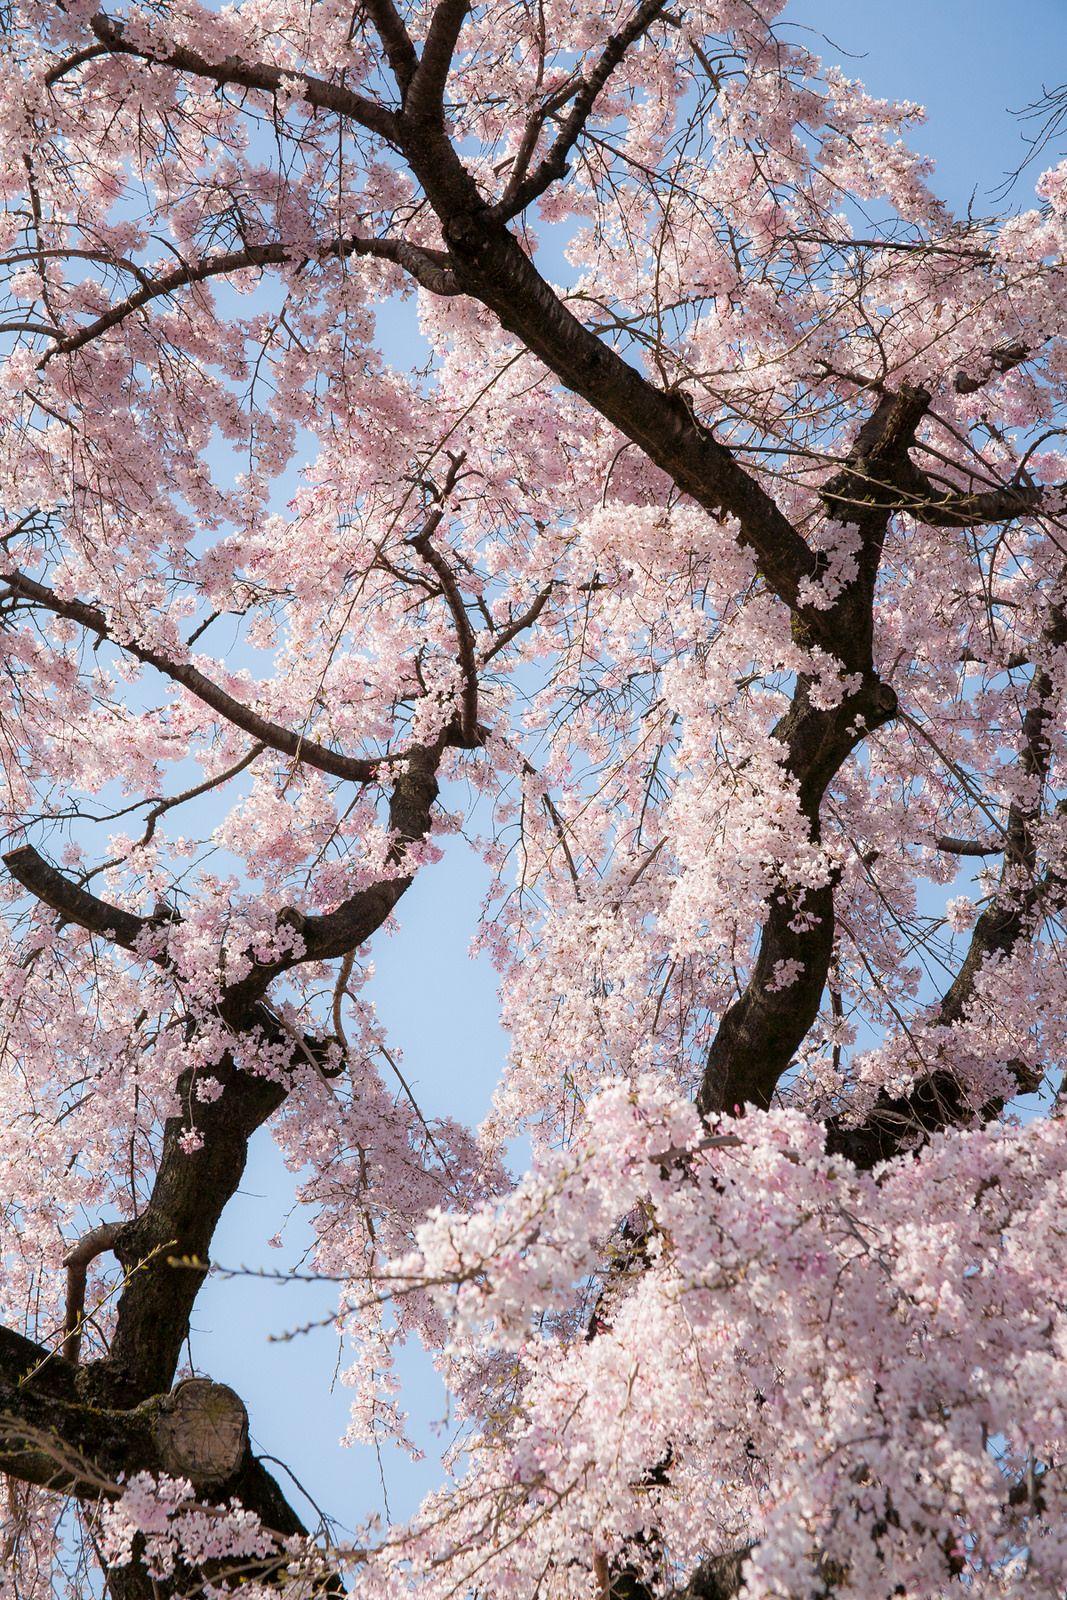 Blippo Kawaii Pastel Aesthetic Aesthetic Pastel Wallpaper Cherry Blossom Tree